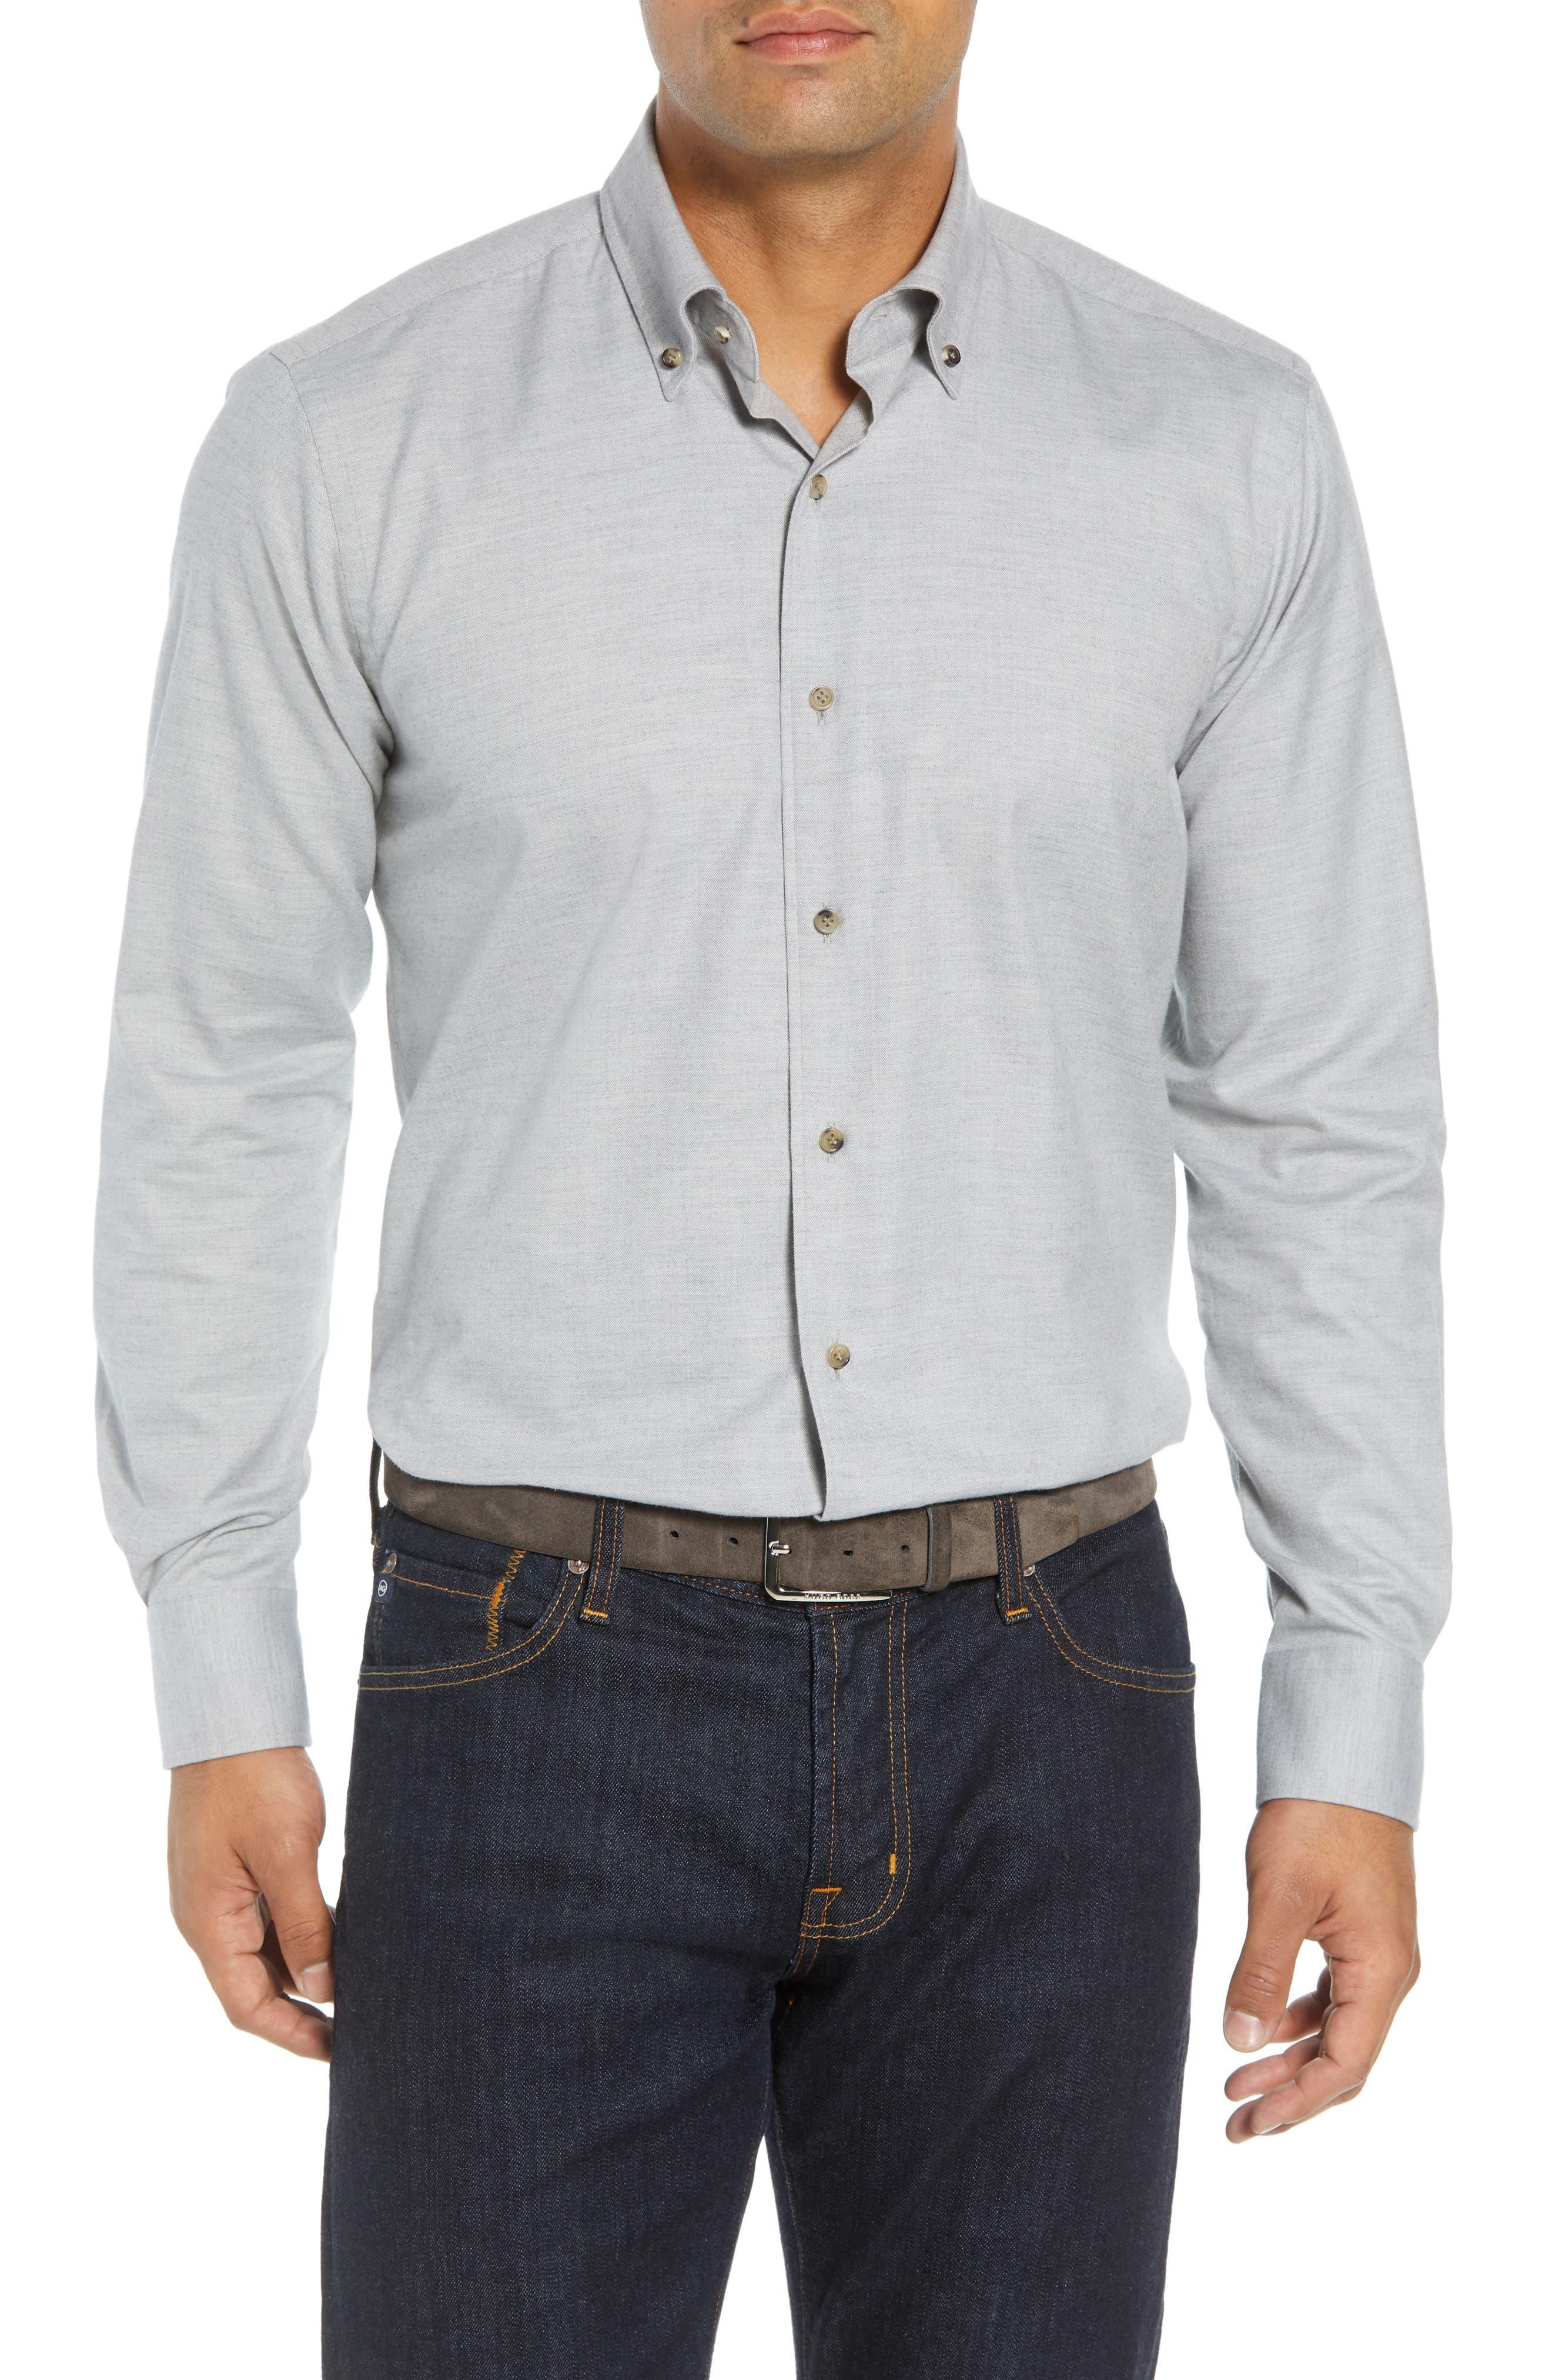 Hamra Regular Fit Sport Shirt,                             Main thumbnail 1, color,                             PLATINUM